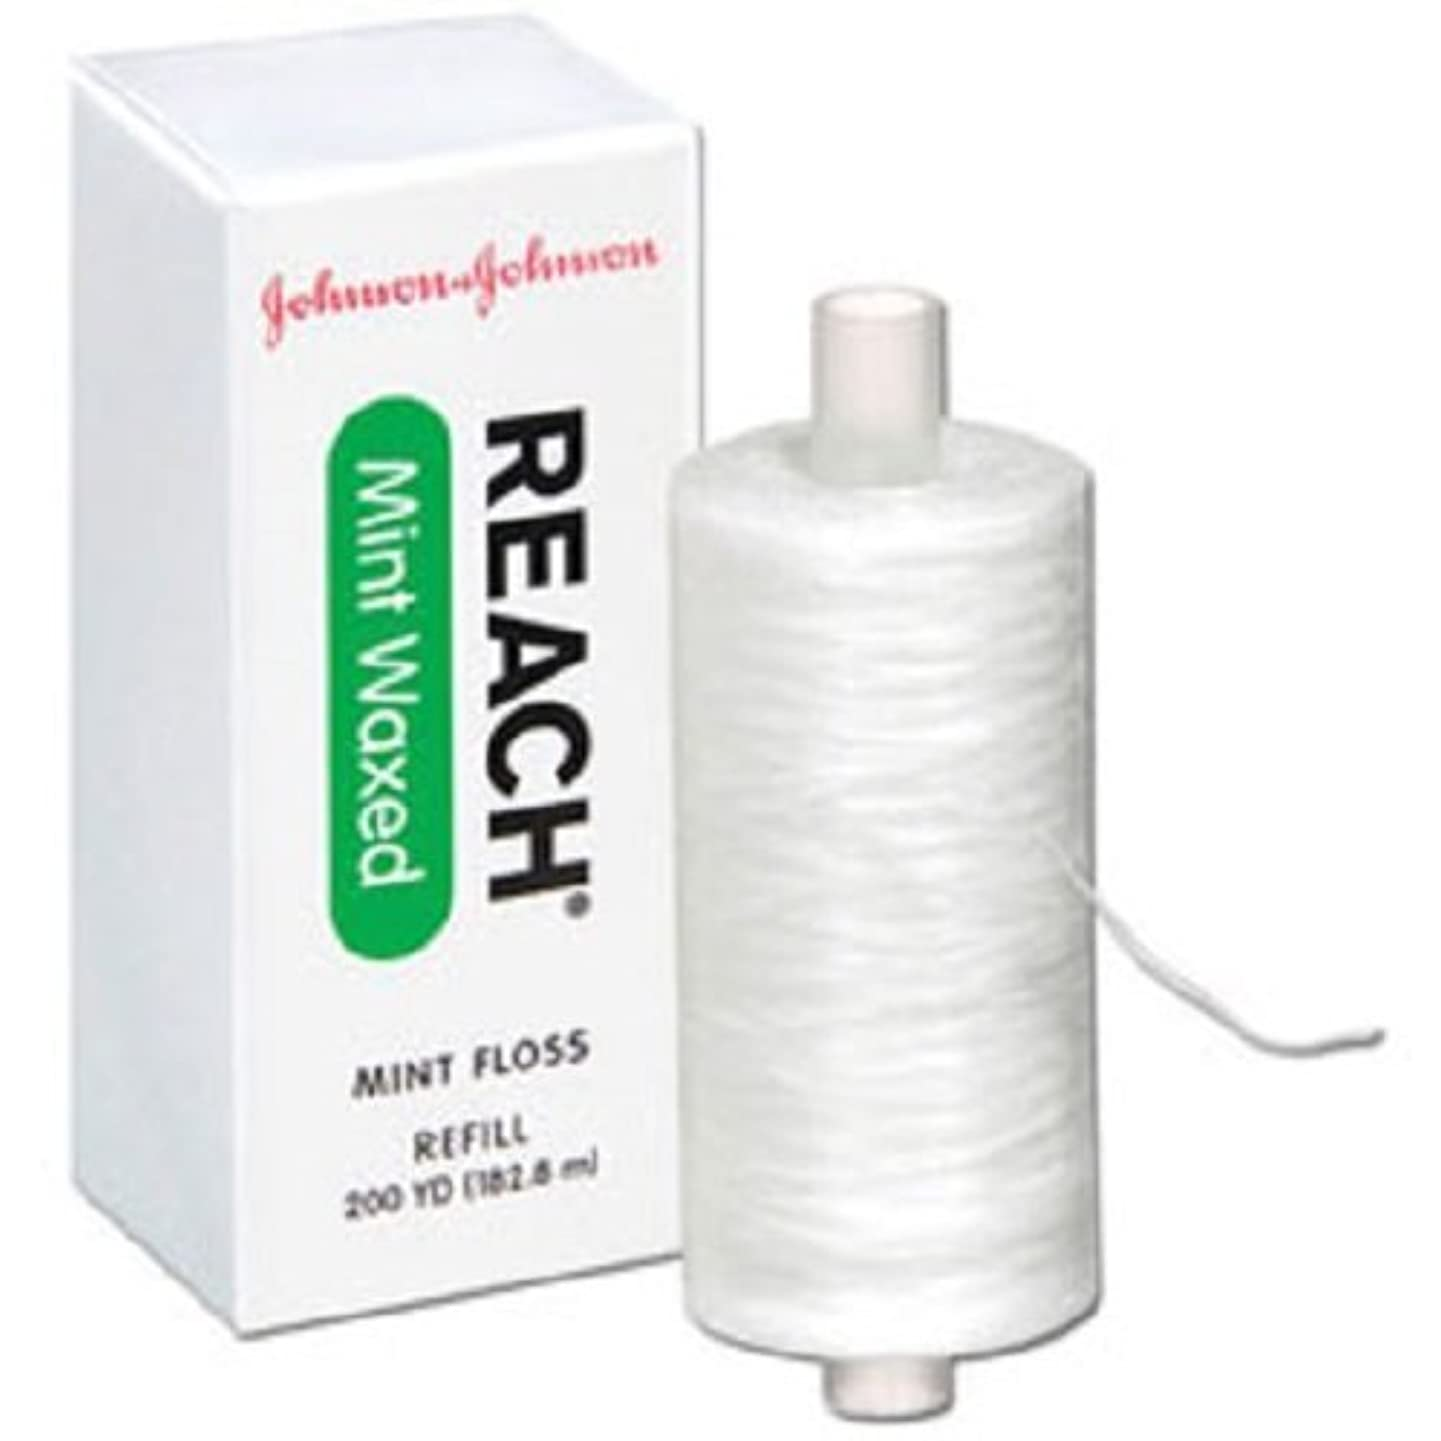 1 x Johnson & Johnson Reach Mint Floss Waxed refill spool, 200 yds, 2733